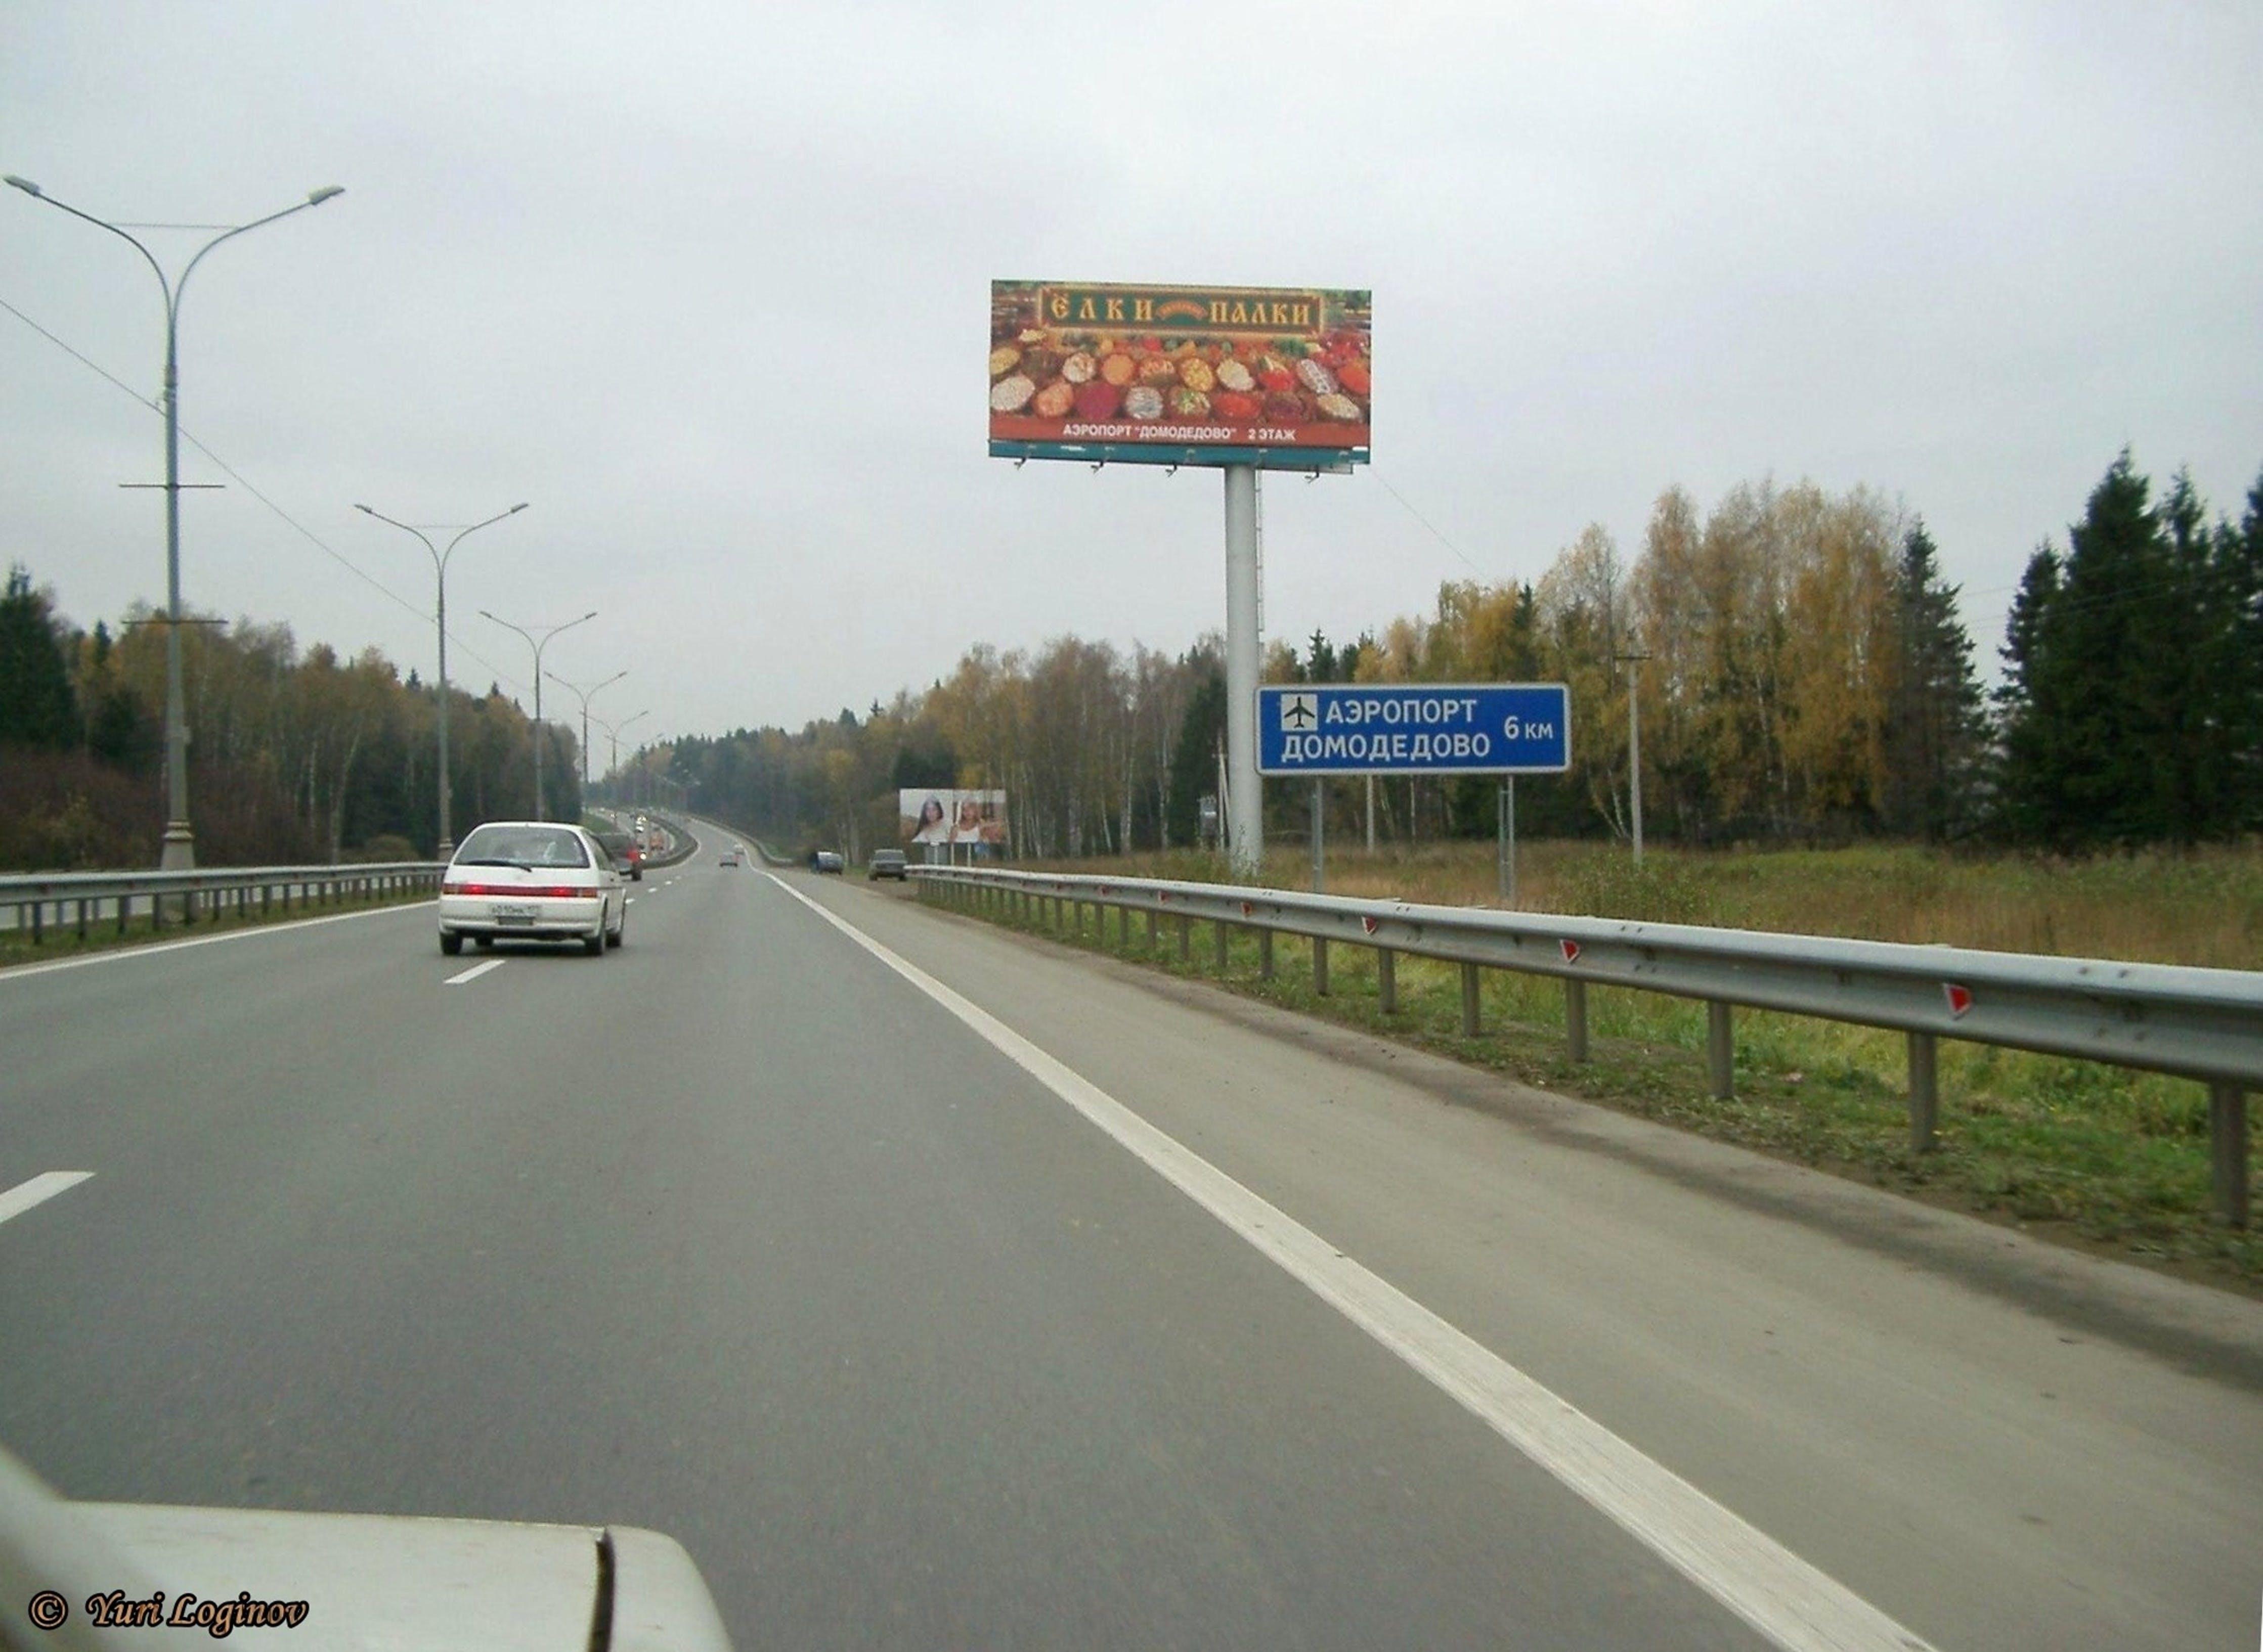 Free stock photo of russia, россия, domodedovo, Домодедово